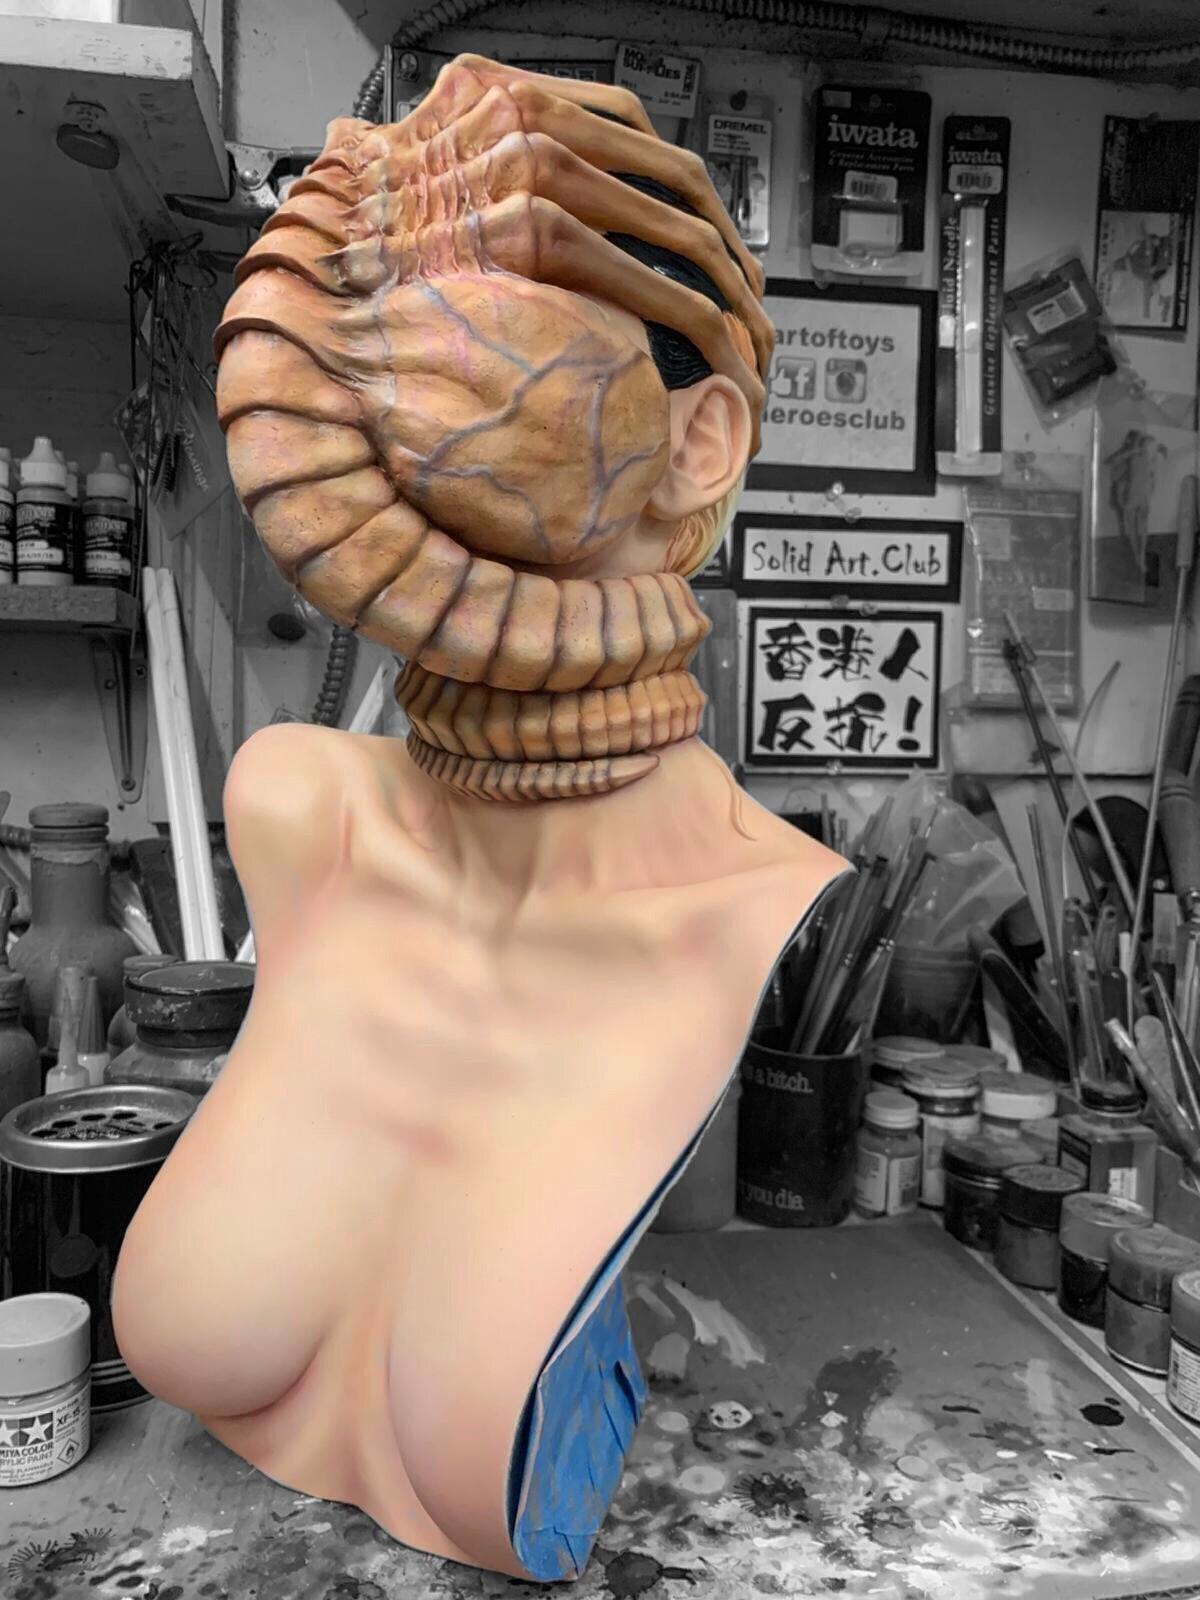 Alien Facehugger The Colonist 1:1 scale Bust Art Statue work in progress...